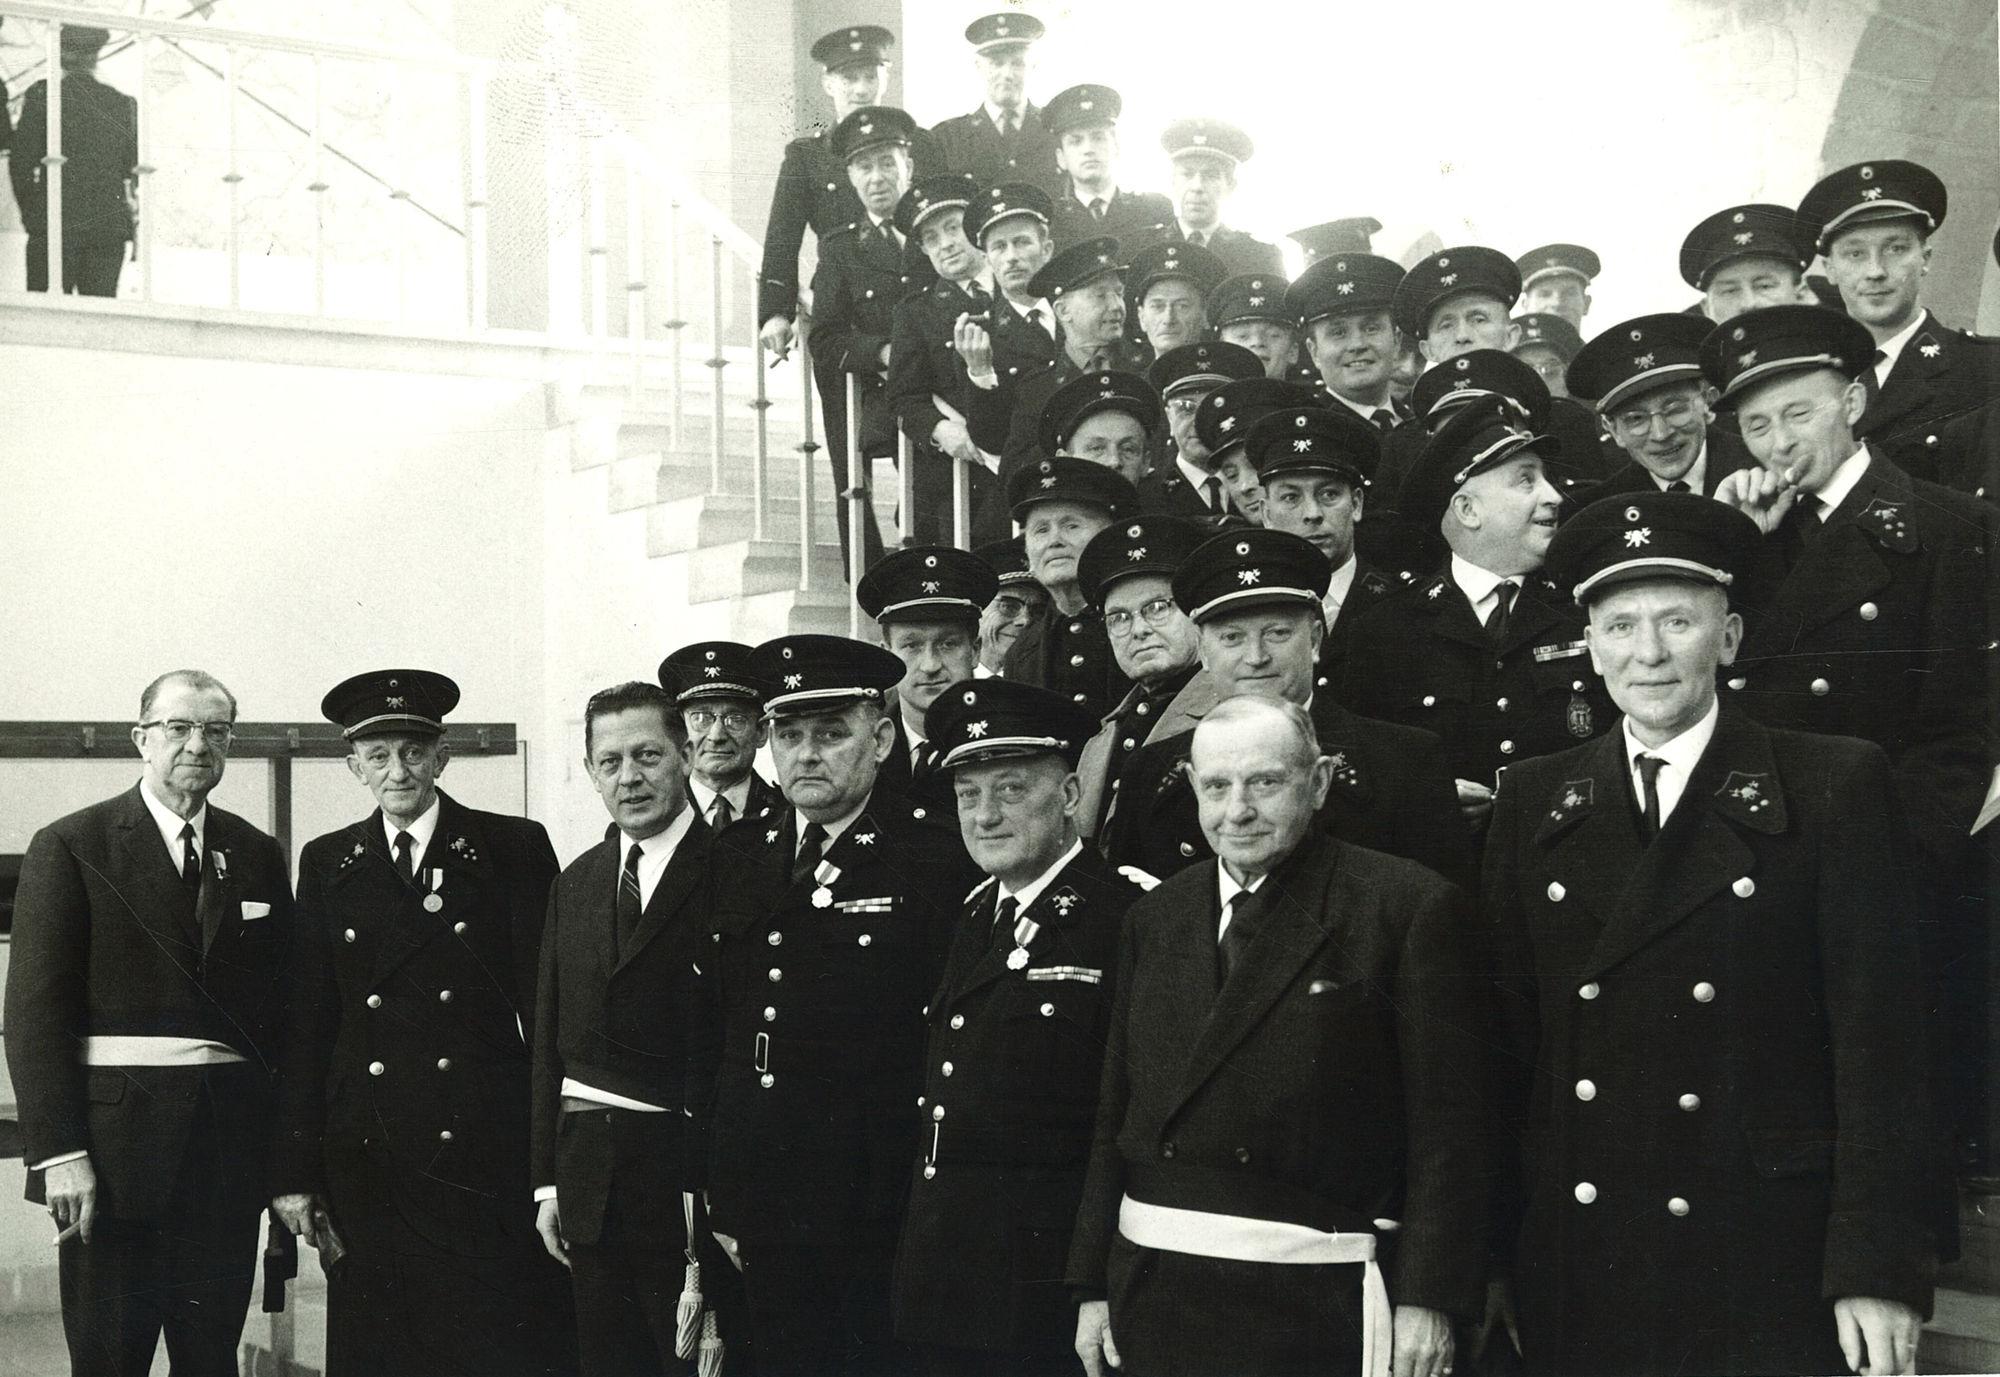 Huldiging brandweerlieden